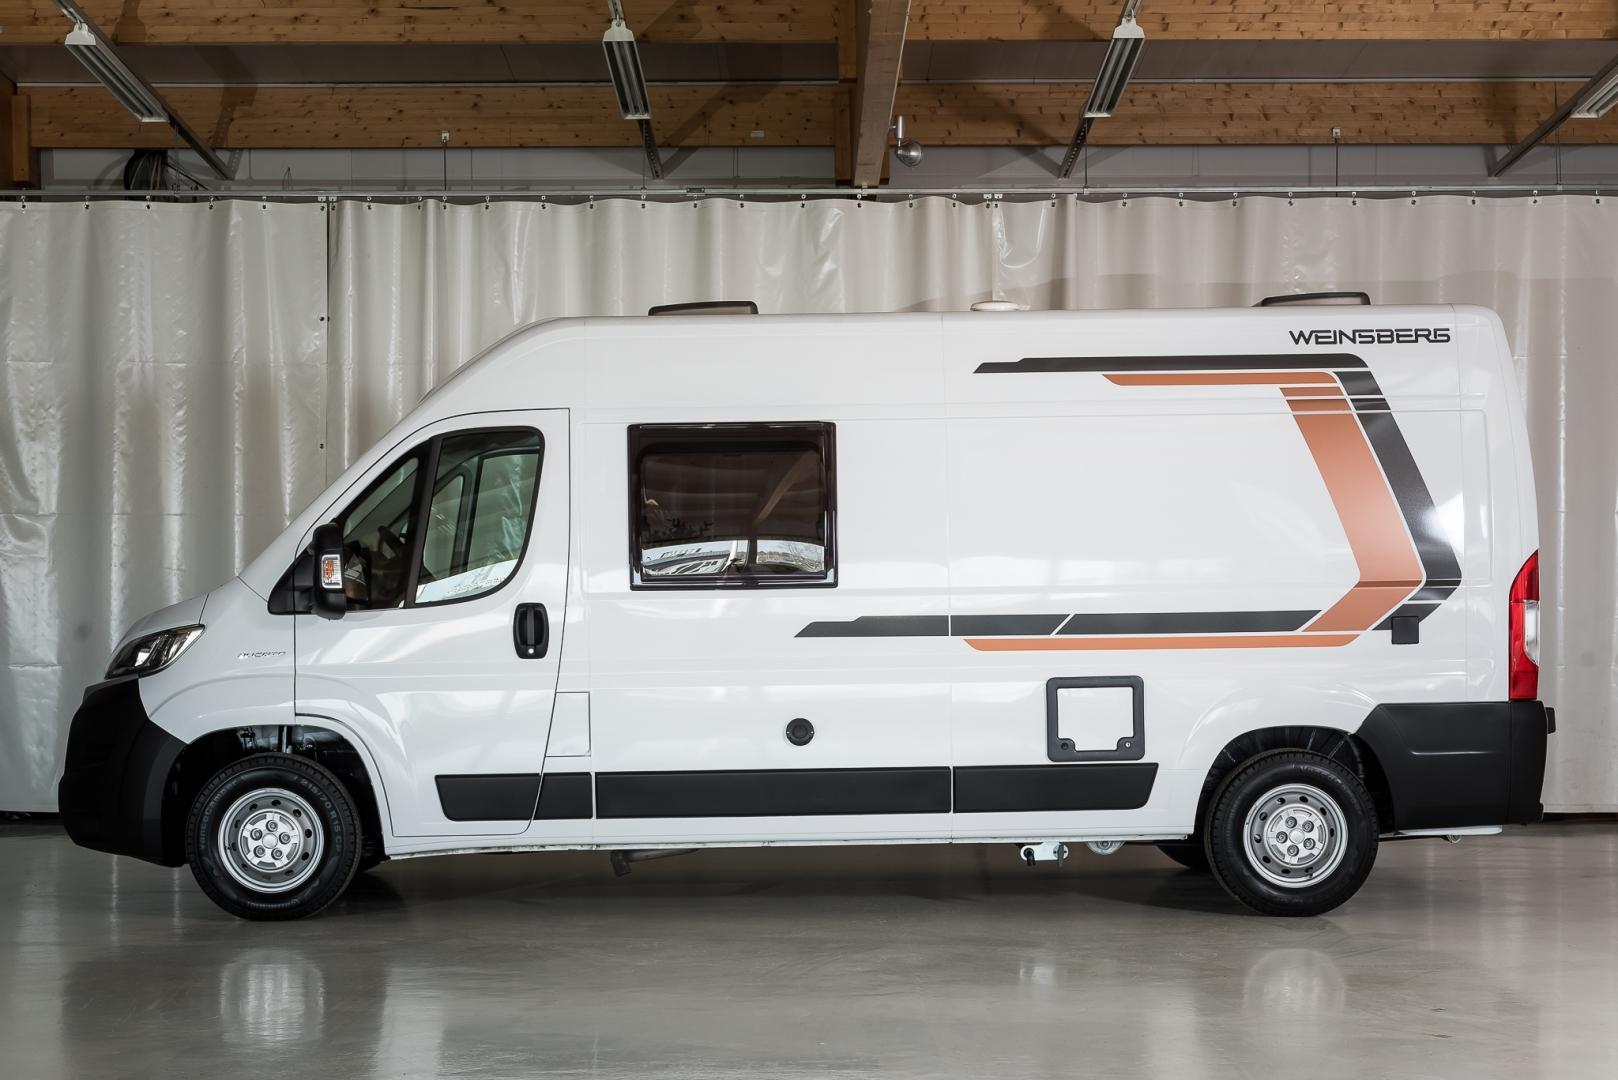 Weinsberg Carabus 600 MQ, 2,3 M-JET 130 HV